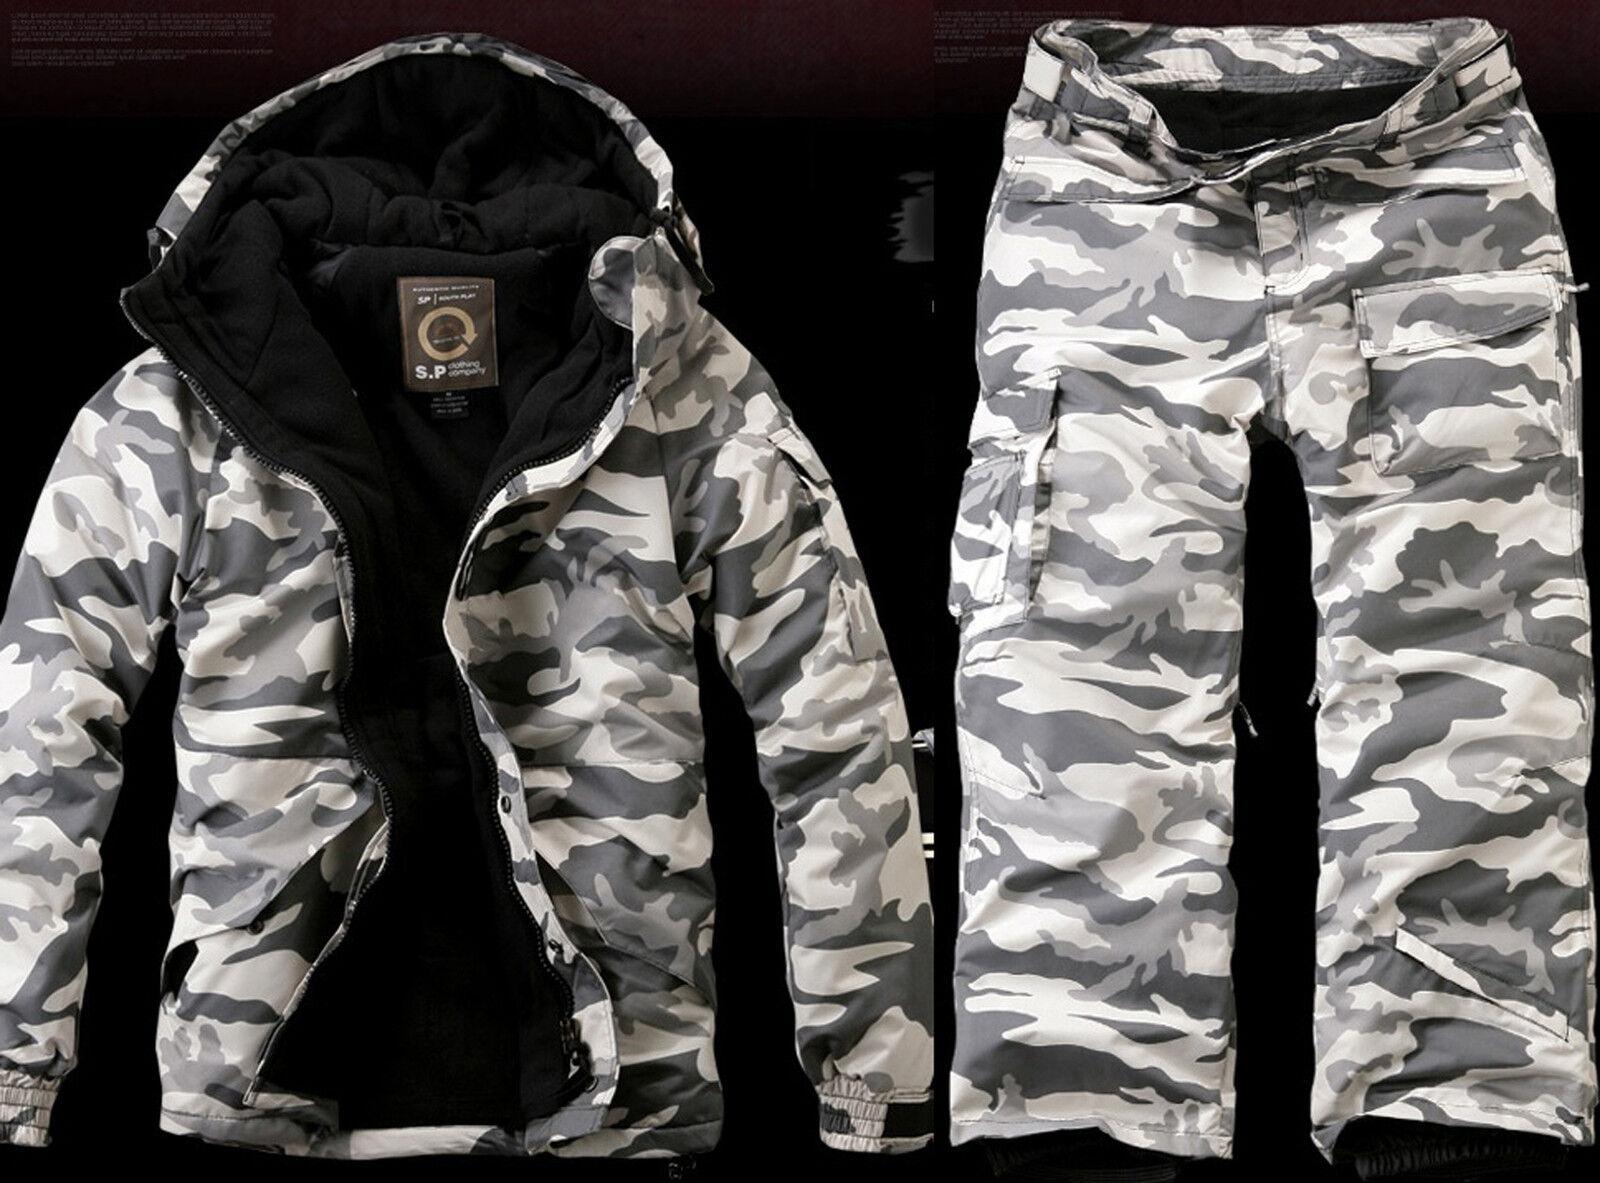 Southplay Mens Premium Winter Waterproof Ski-Snowboard Wear BJ107(Size- S2XL)